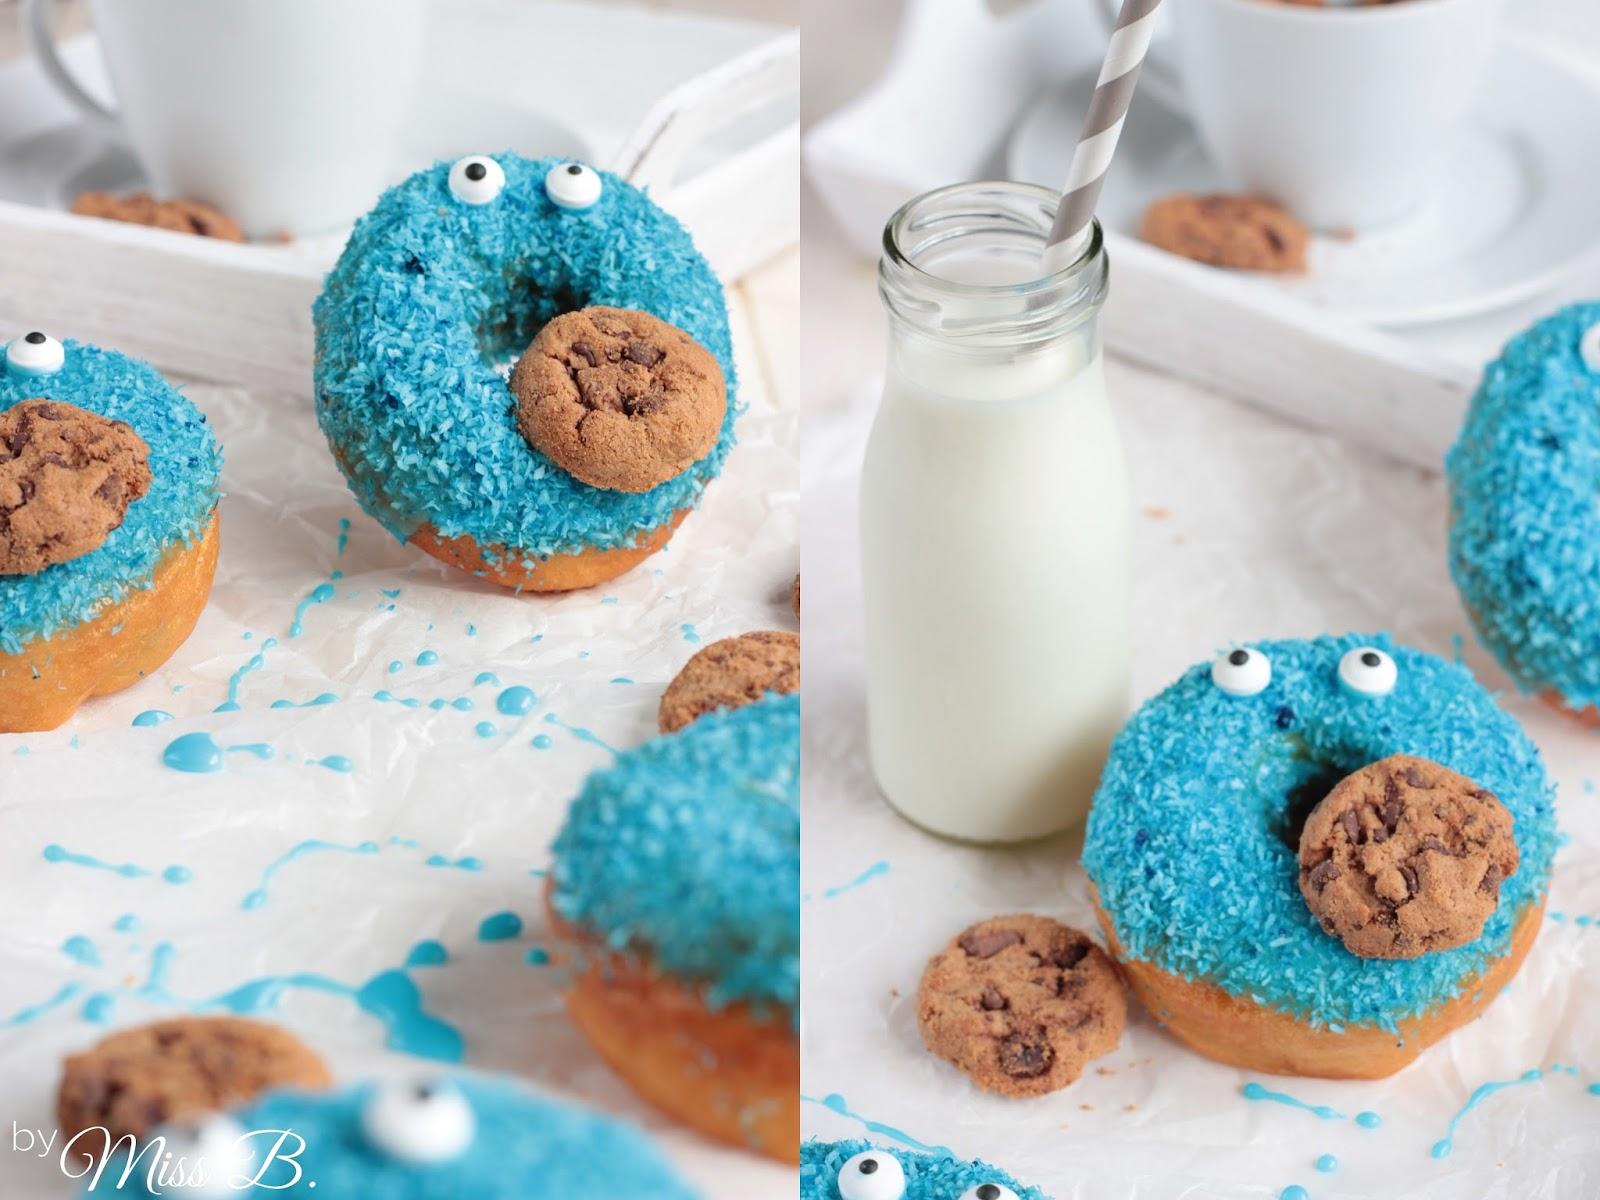 blauen zuckerguss selber machen